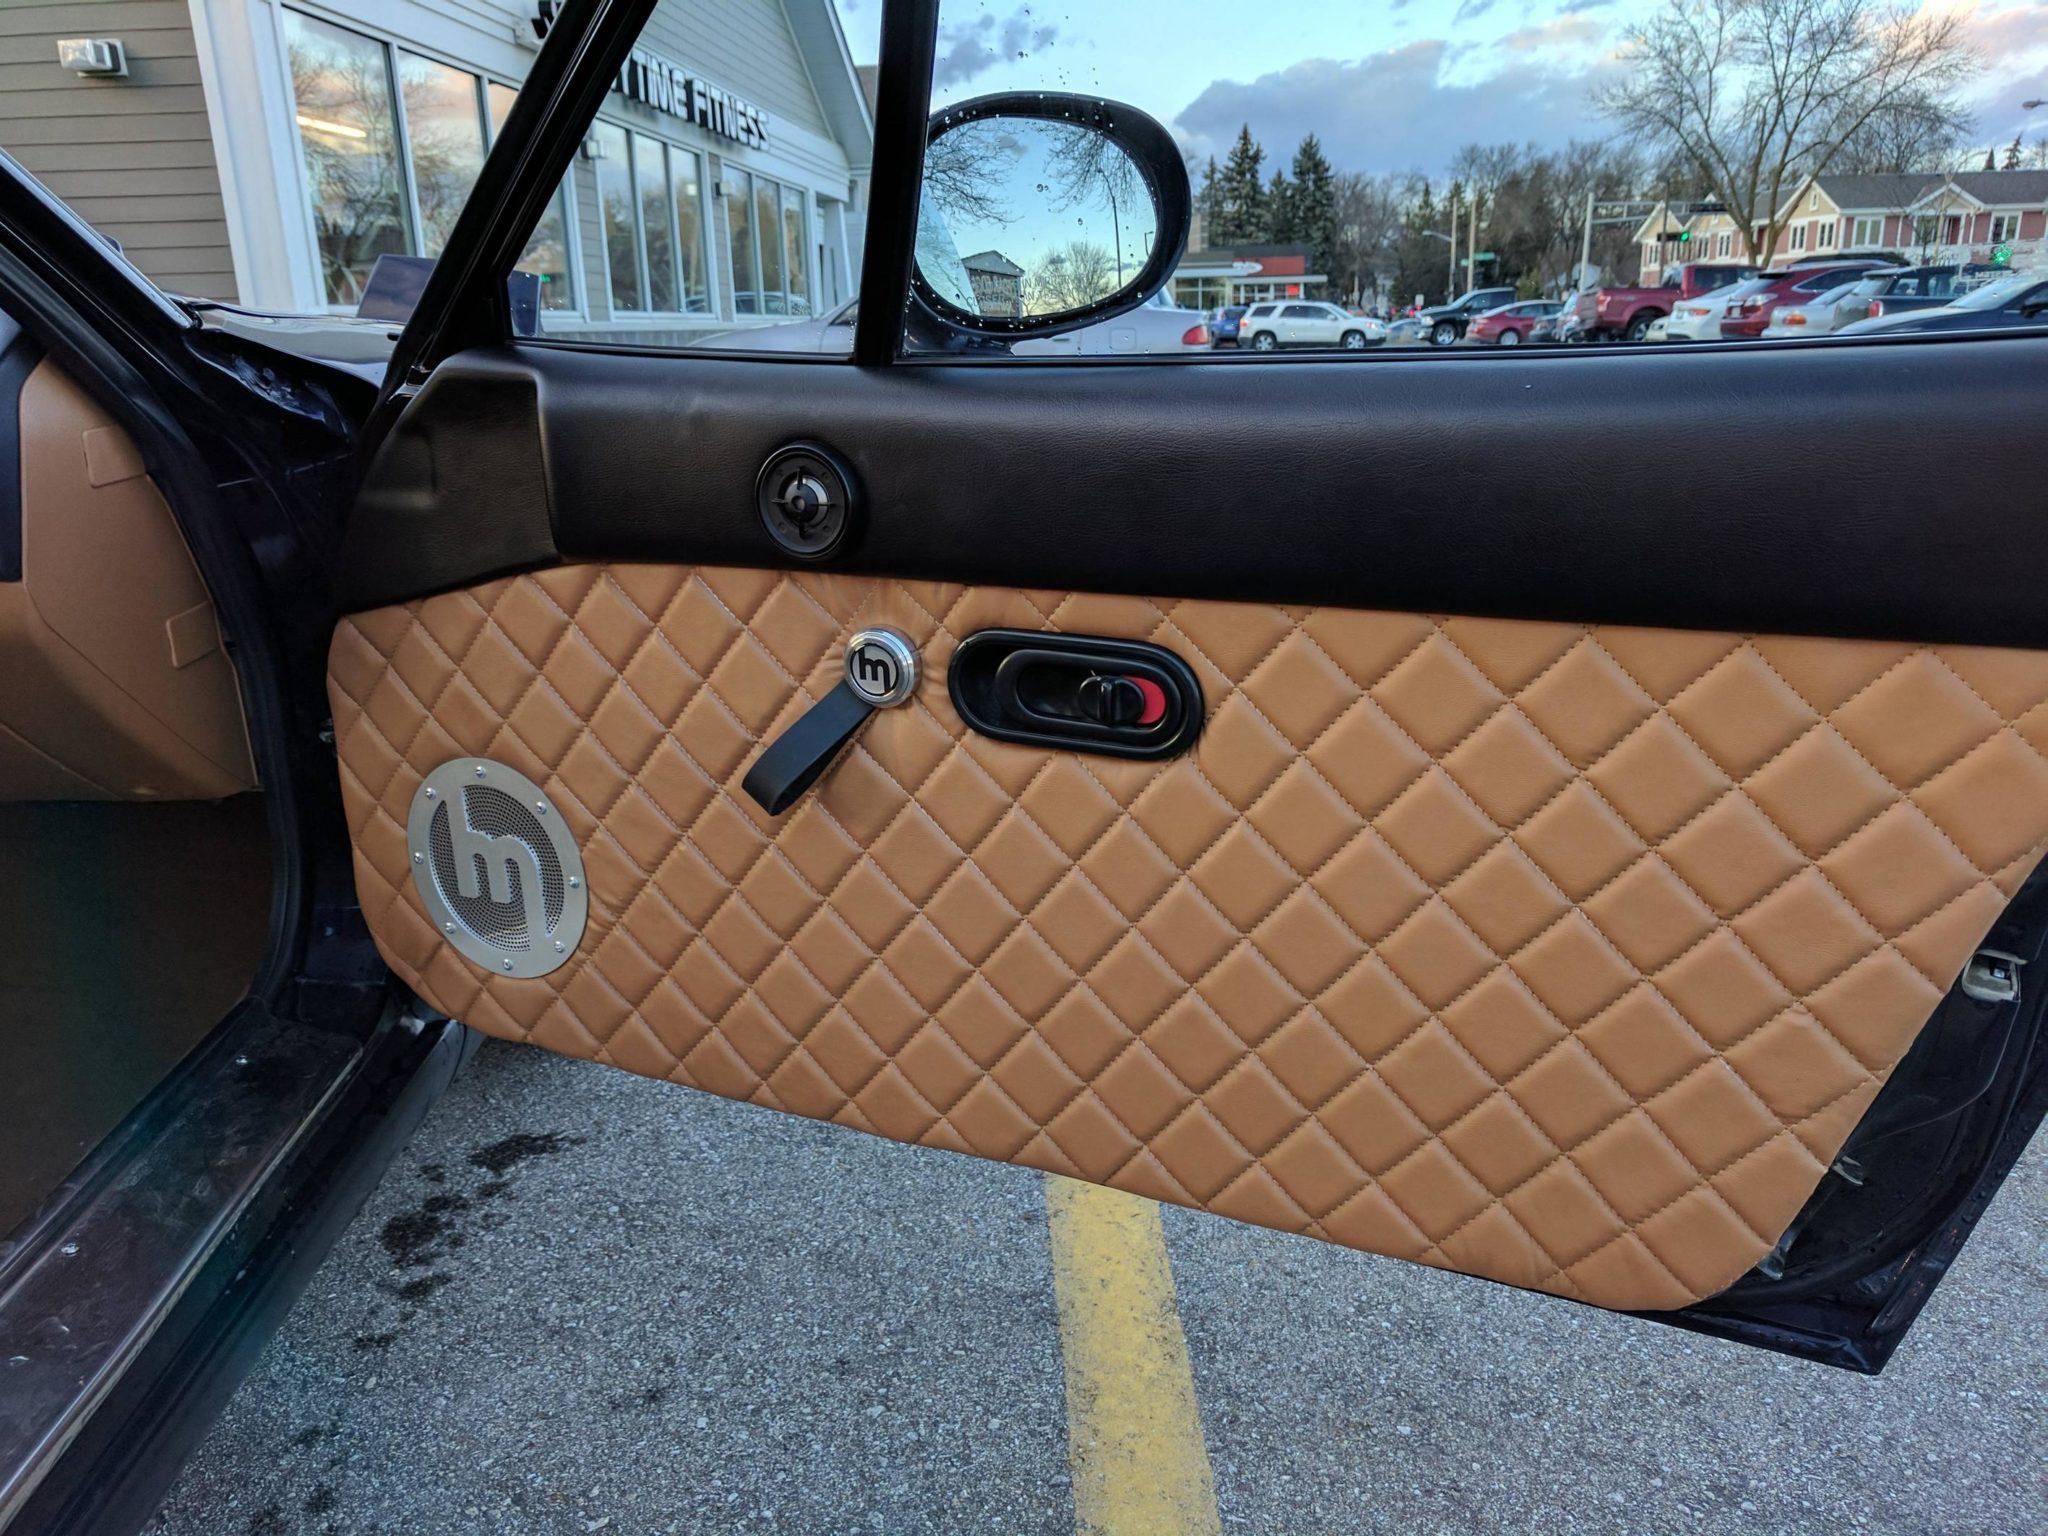 Carbon Fiber Top Door Pads For Miata NA/Mk1 - The Ultimate